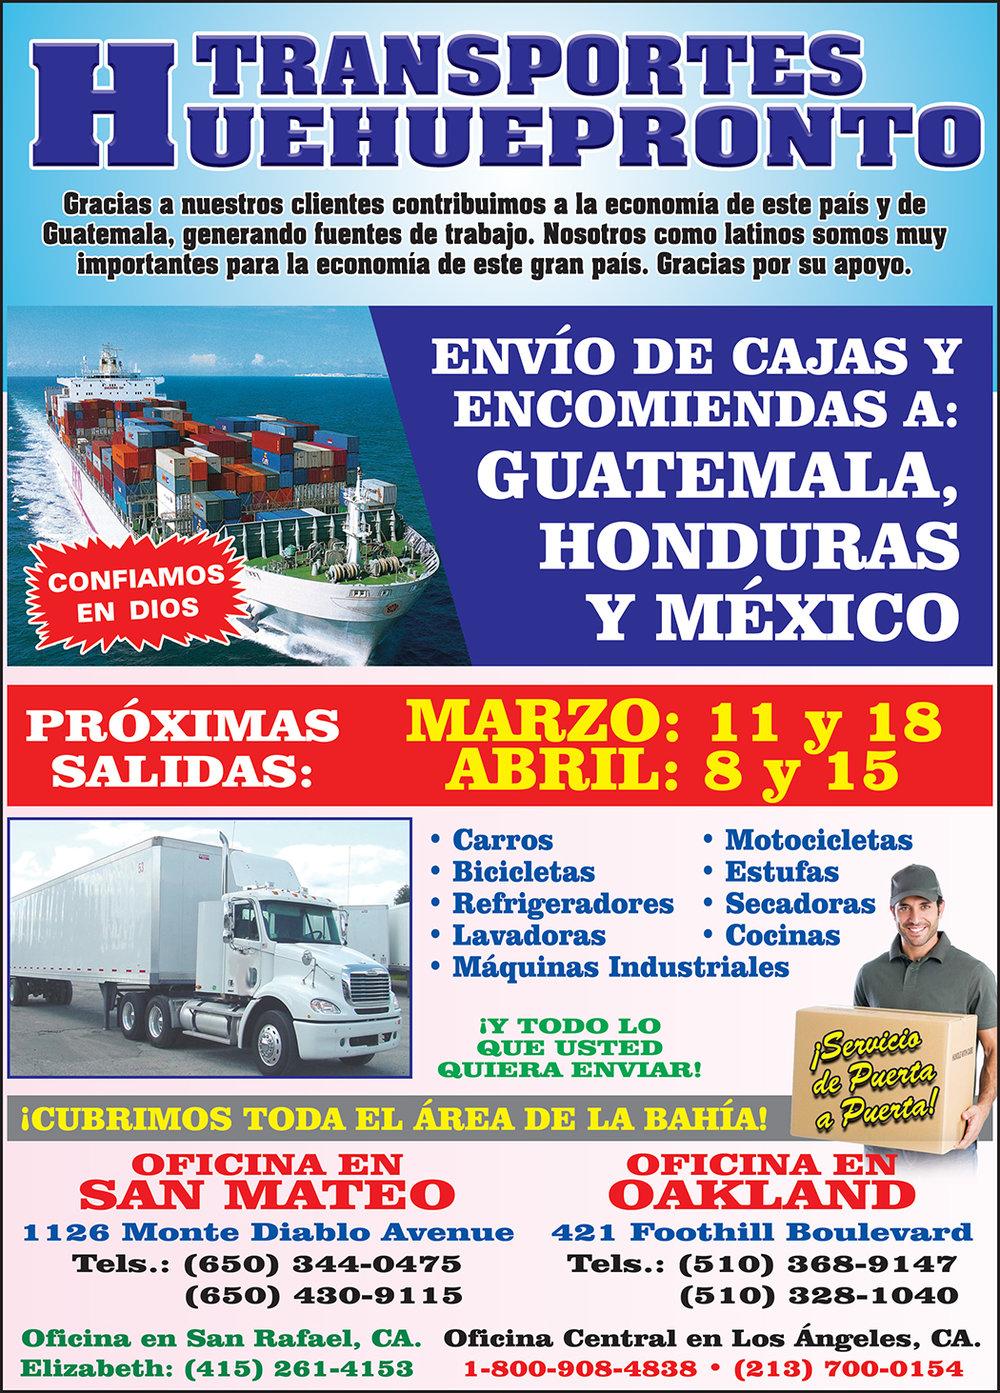 Transportes Huehuepronto 1pag - marzo 2018.jpg